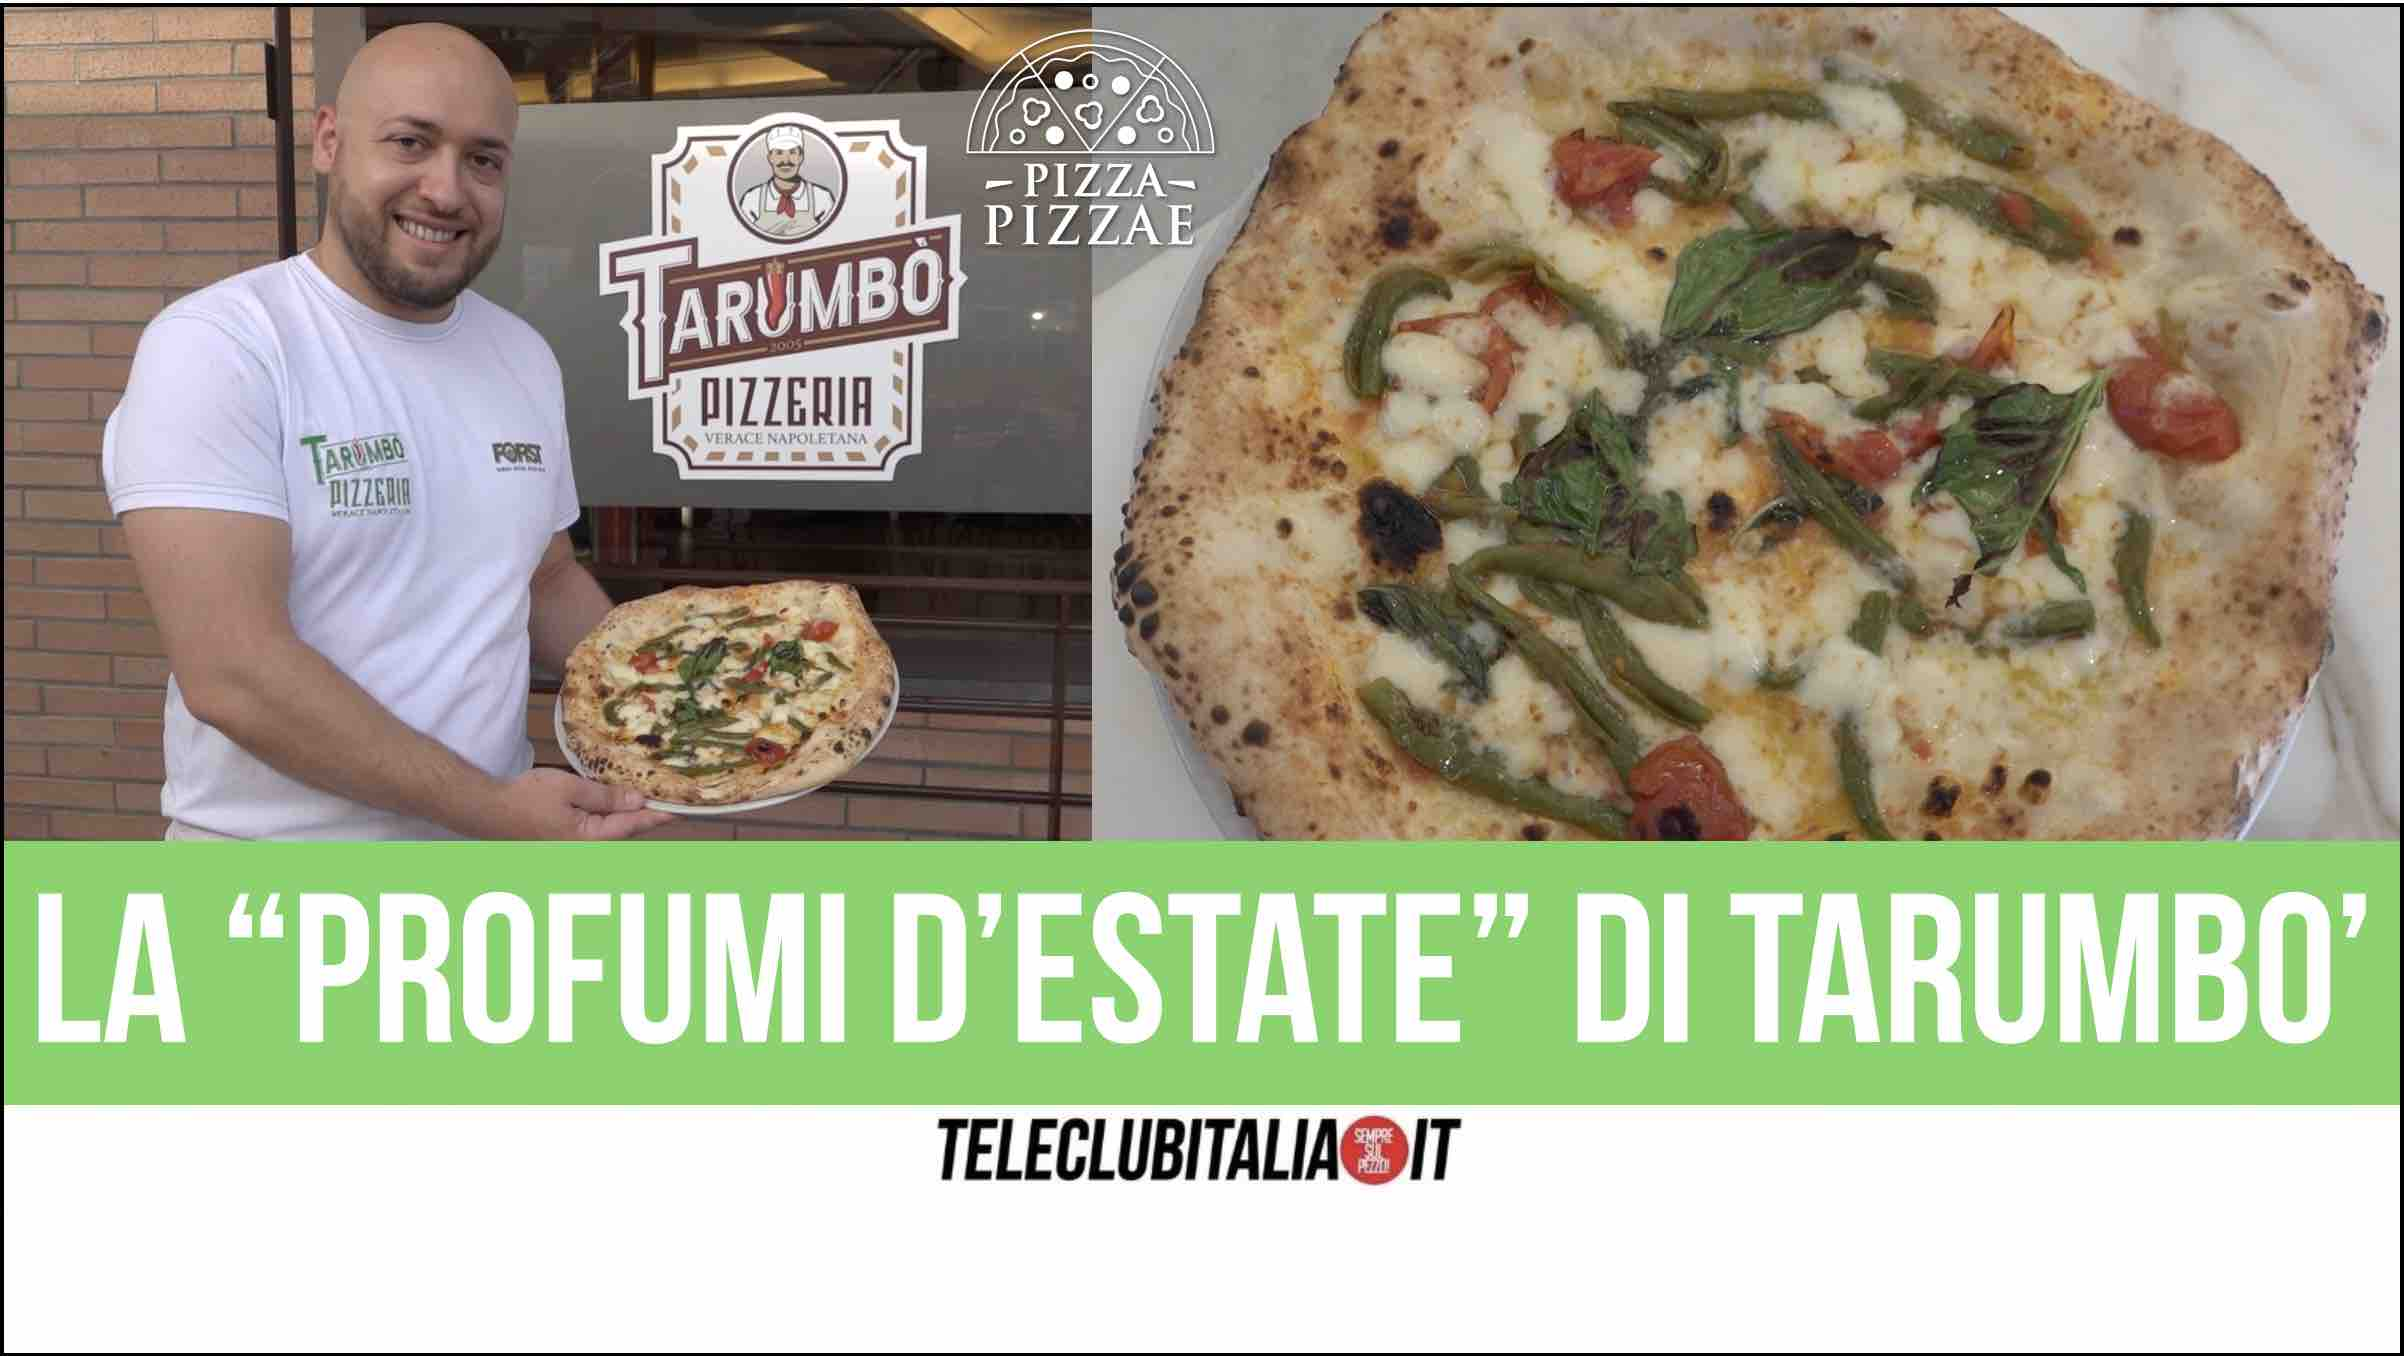 profumi d'estate tarumbo' pizza sant'arpino